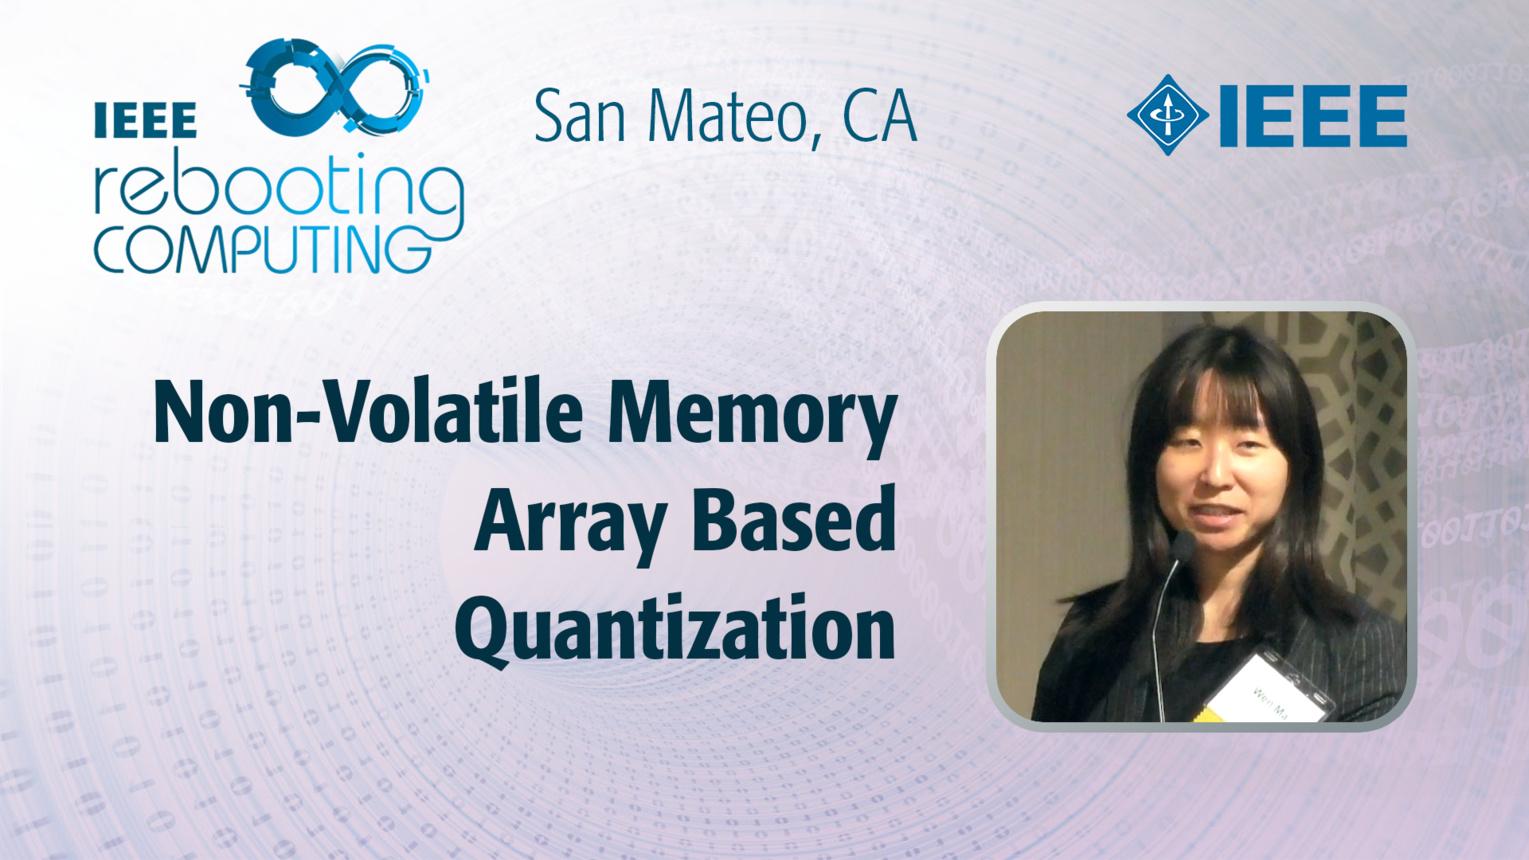 Non-Volatile Memory Array Based Quantization - Wen Ma - ICRC San Mateo, 2019